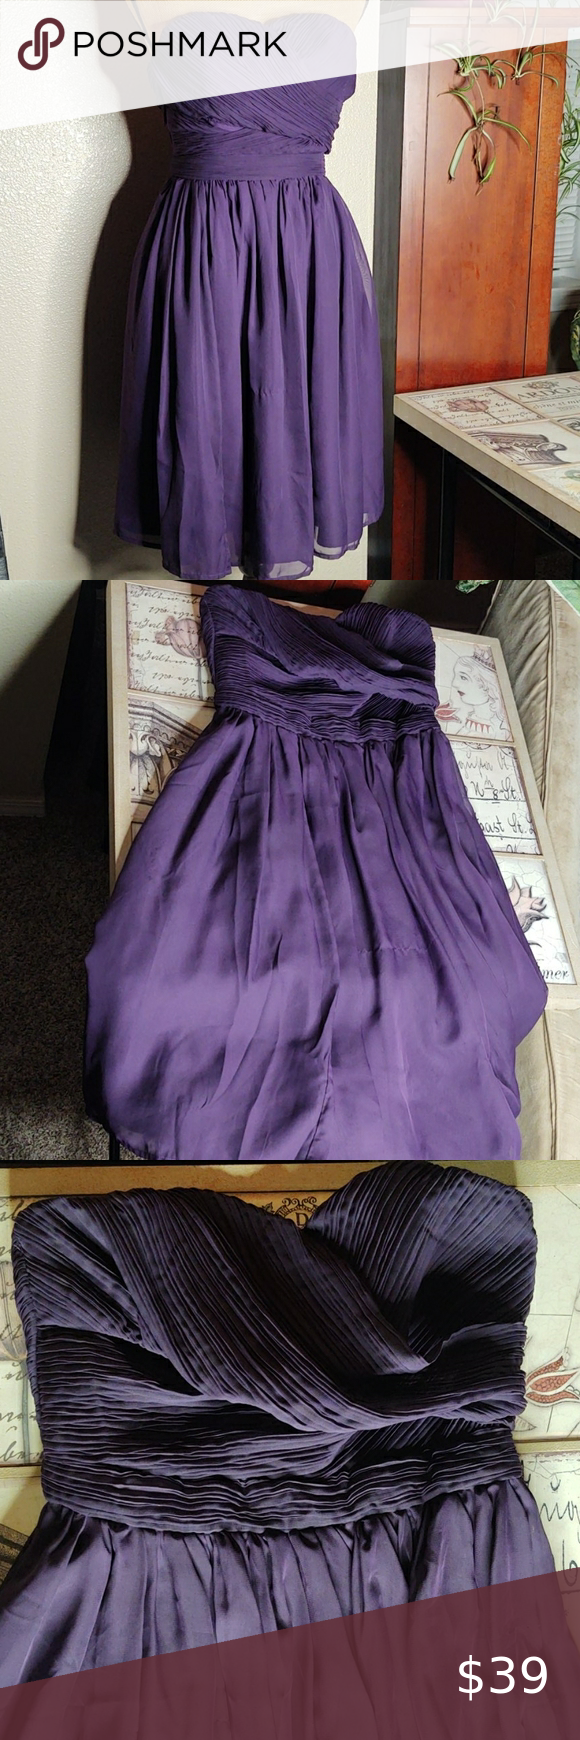 Tevolio Dark Purple Strapless Target Formal Dress Purple Dresses Formal Formal Dresses Blush Pink Bridesmaid Dresses [ 1740 x 580 Pixel ]